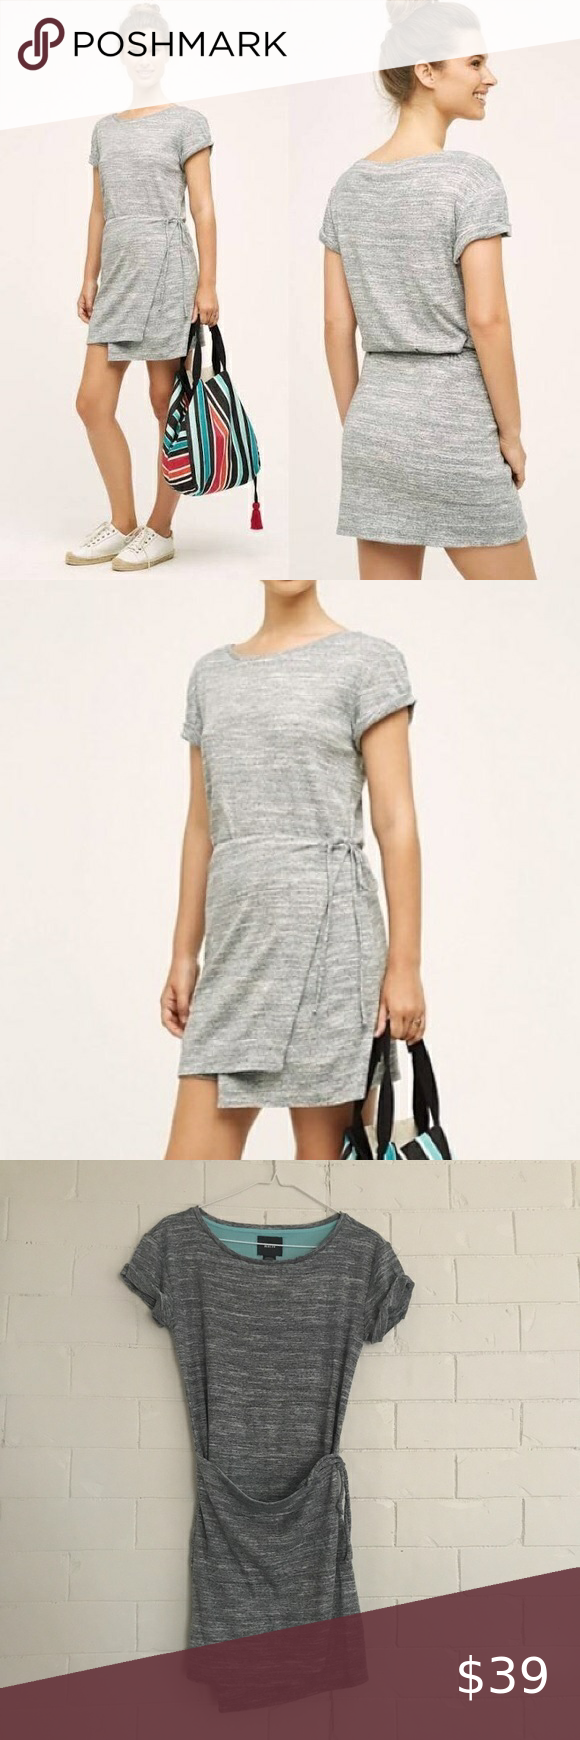 Anthropologie Maeve Gray T Shirt Wrap Dress Xs Wrap Dress Dresses Xs Clothes Design [ 1740 x 580 Pixel ]